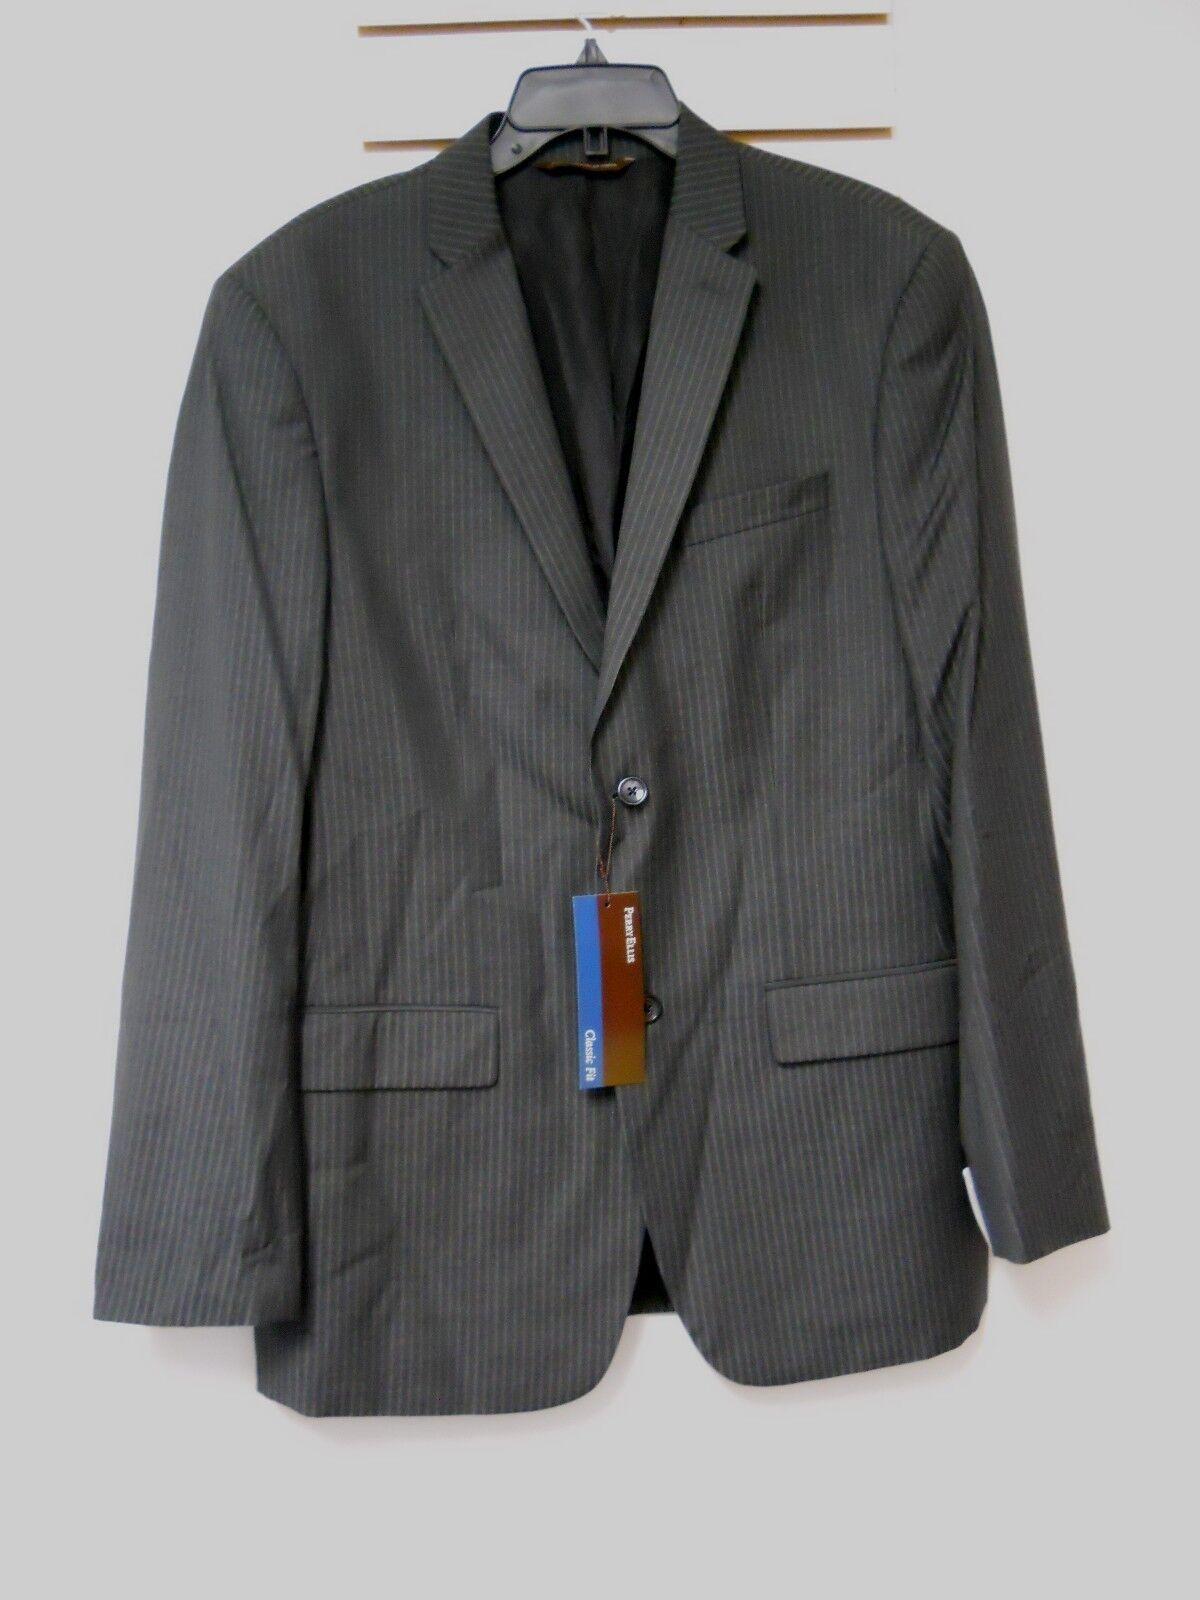 Perry Ellis New  Herren Classic Fit The Artist Charcoal Pinstriped Blazer 42 Reg